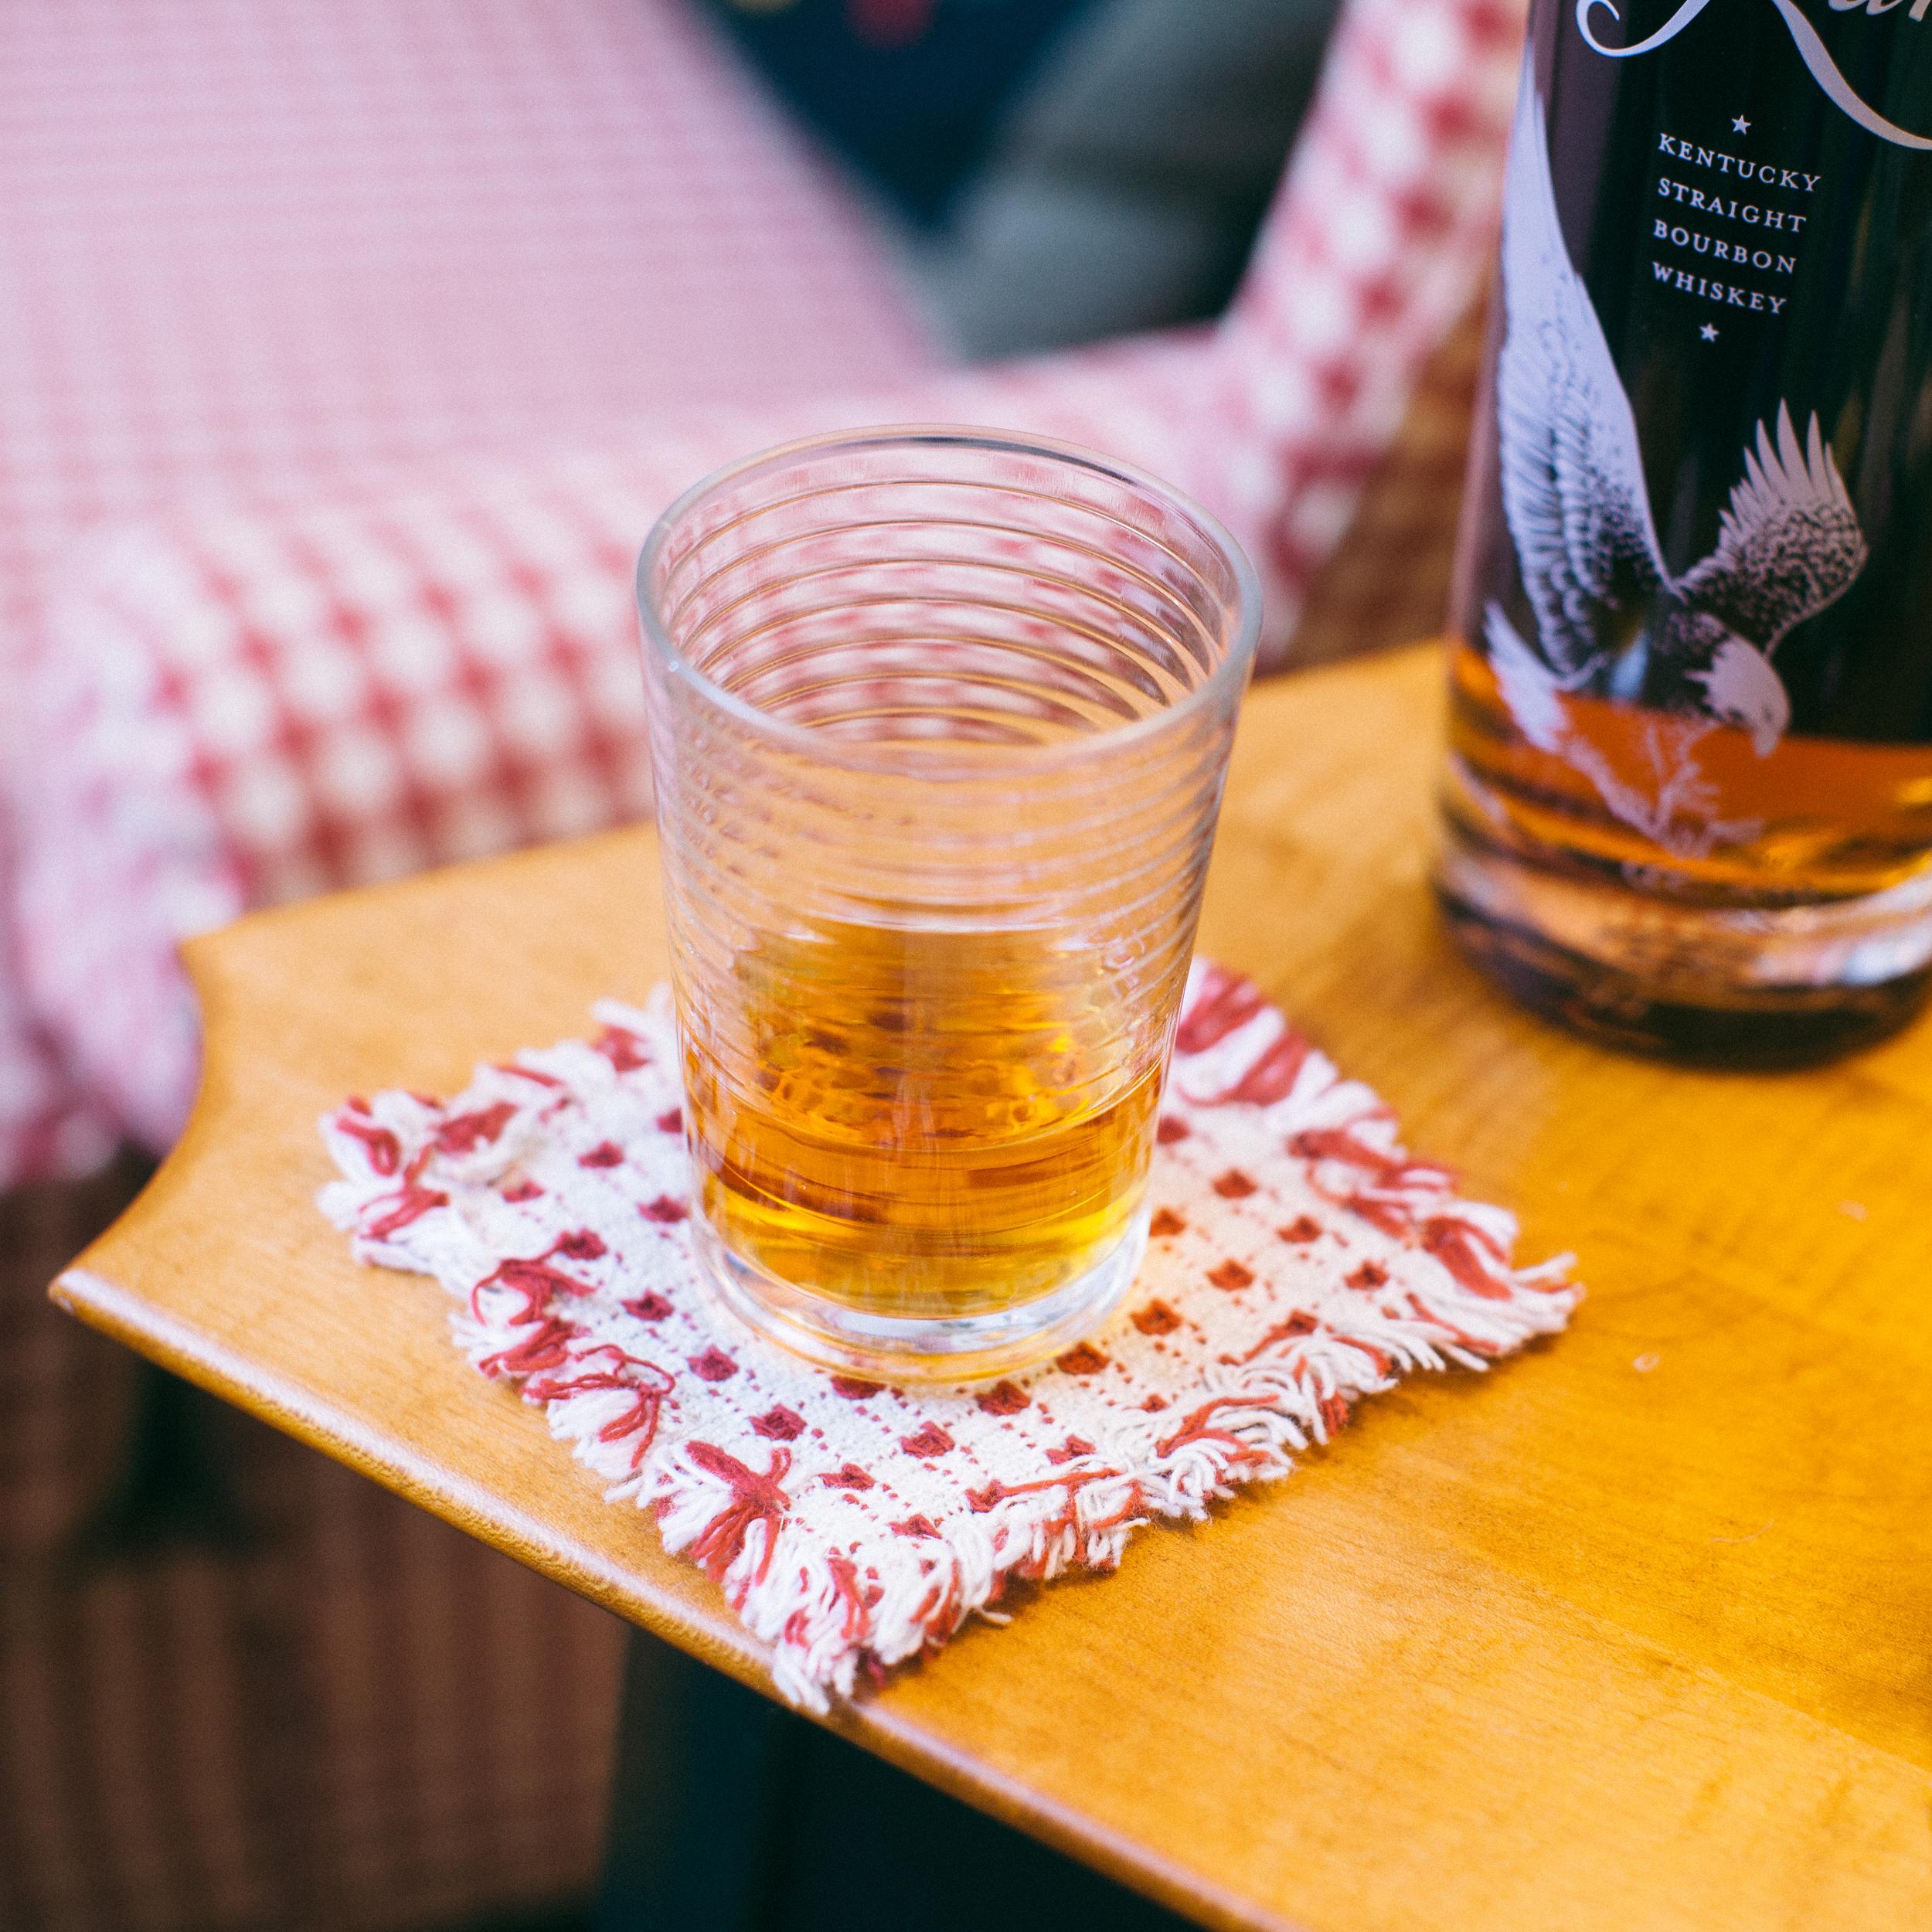 Eagle Rare Kentucky straight bourbon whiskey, neat.